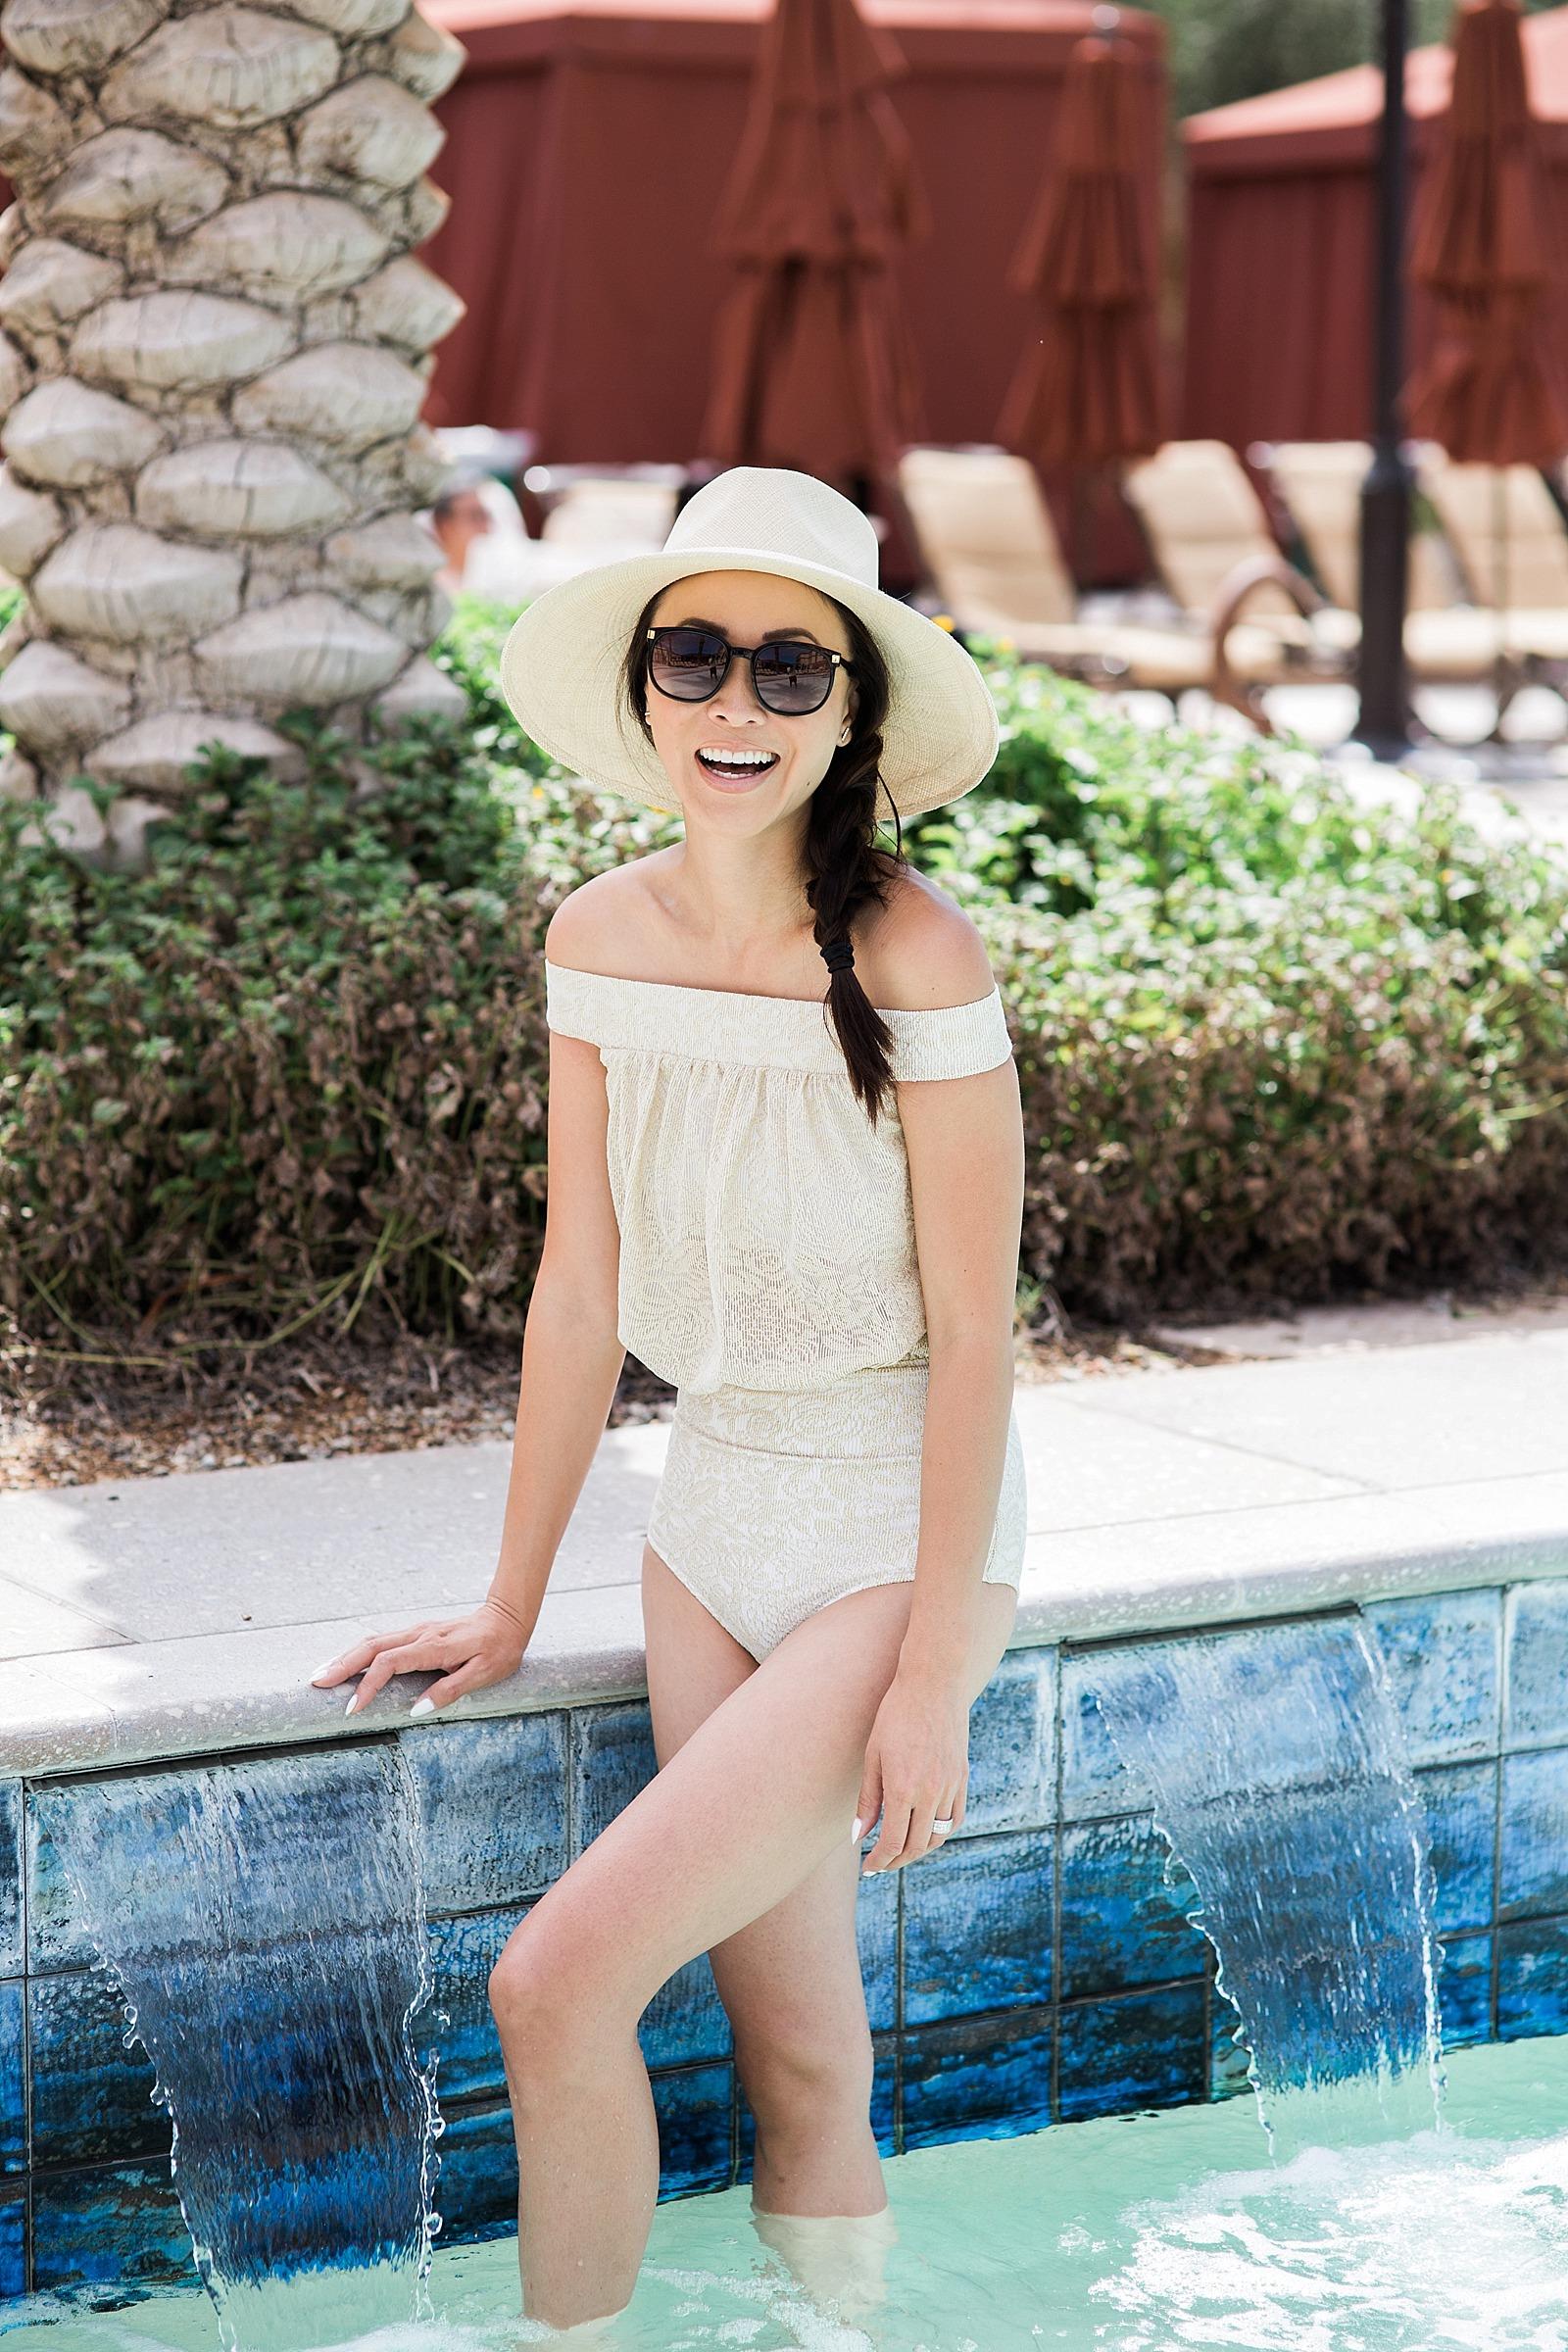 off-shoulder-bikini-riot-swimsuit-casino-del-sol-diana-elizabeth-blog-lifestyle-blogger-style_0043